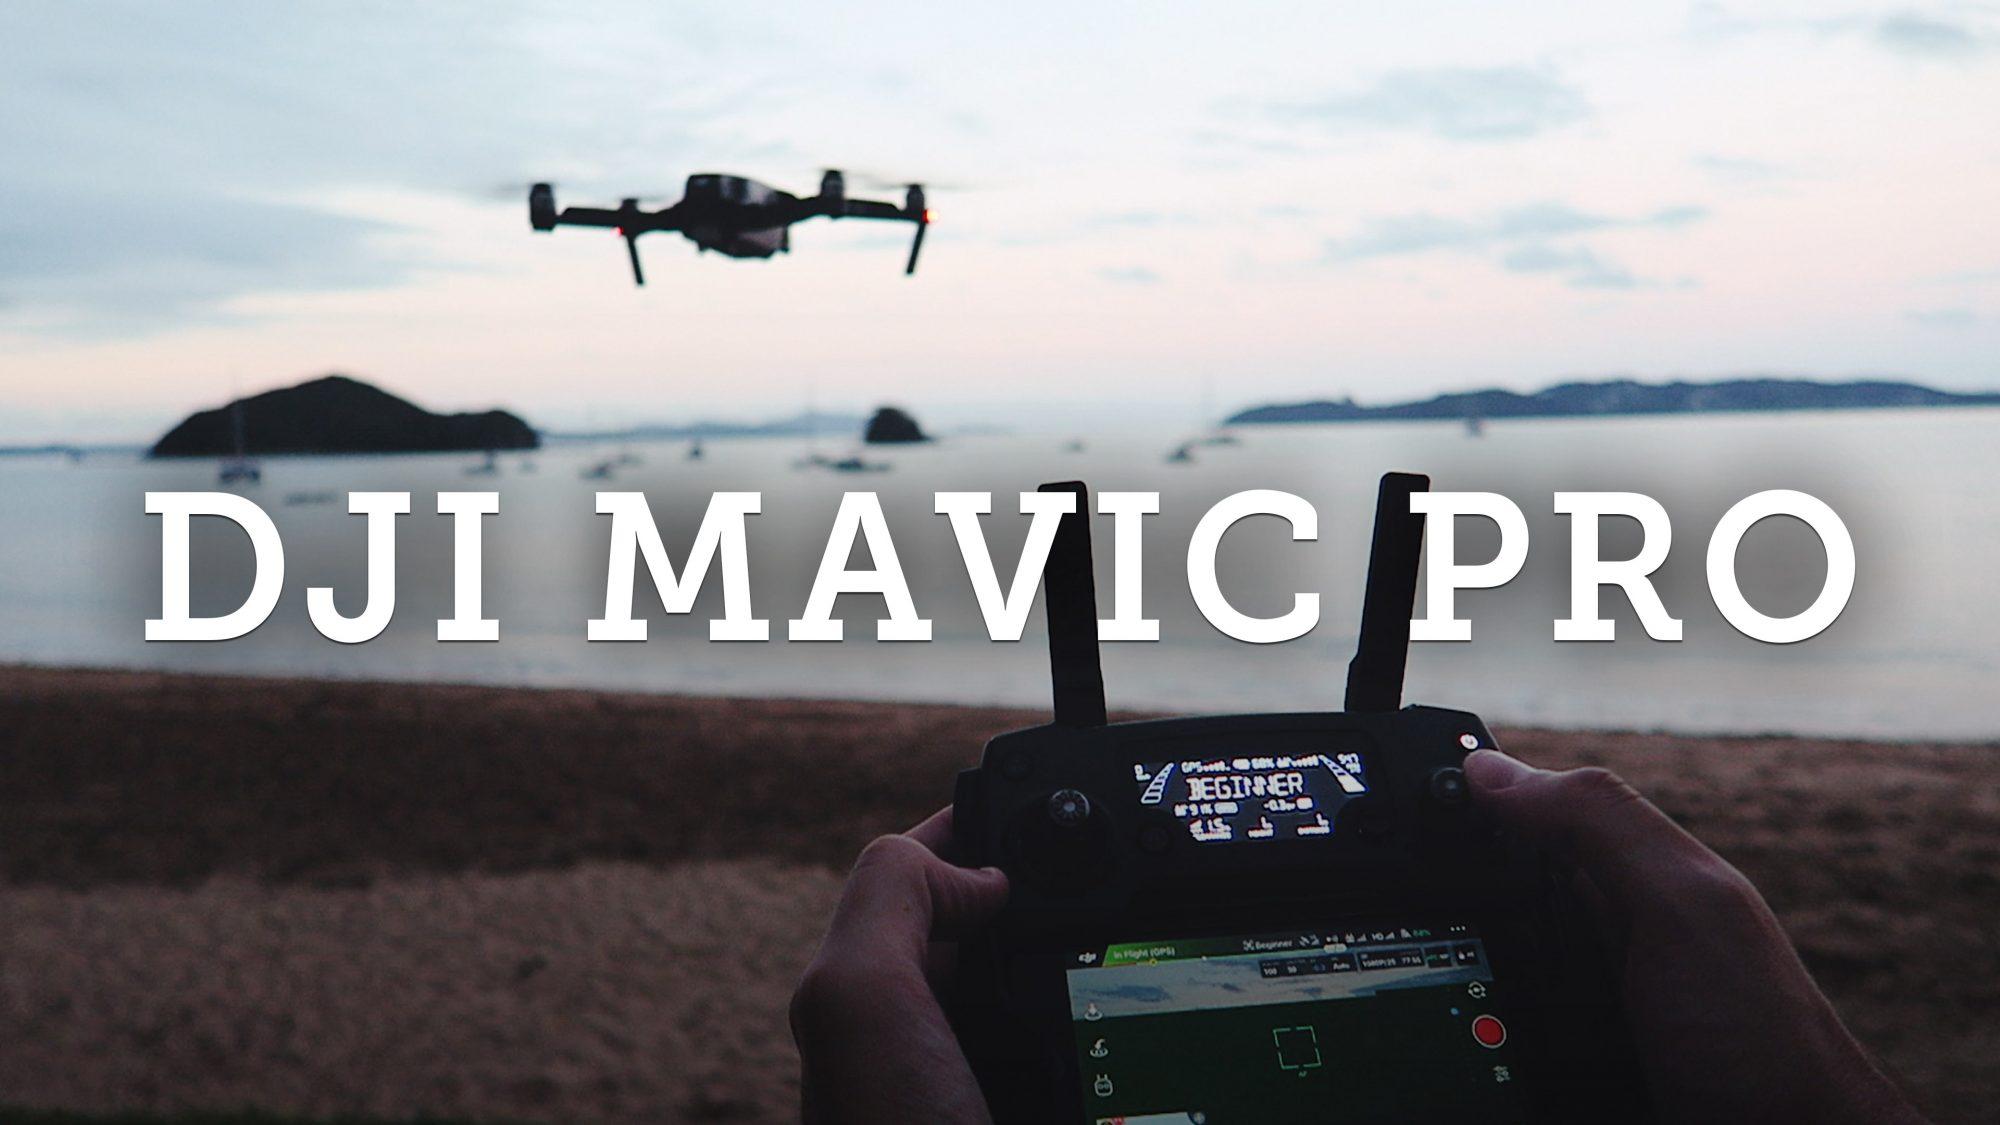 DJI Mavic Pro First time flying a drone